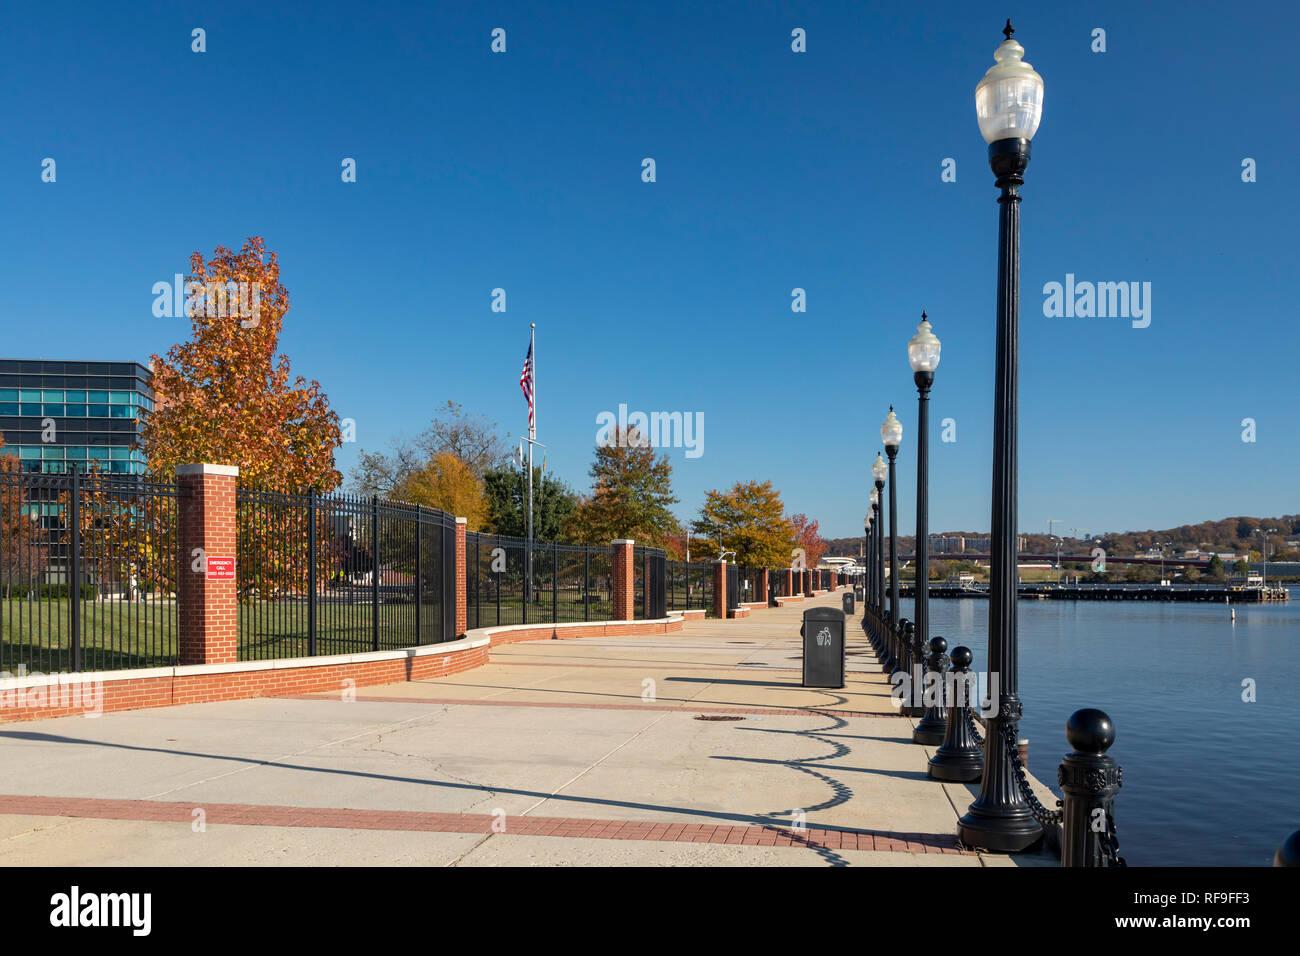 Washington, DC - The Anacostia Riverwalk Trail, adjacent to the Washington Navy Yard. Stock Photo